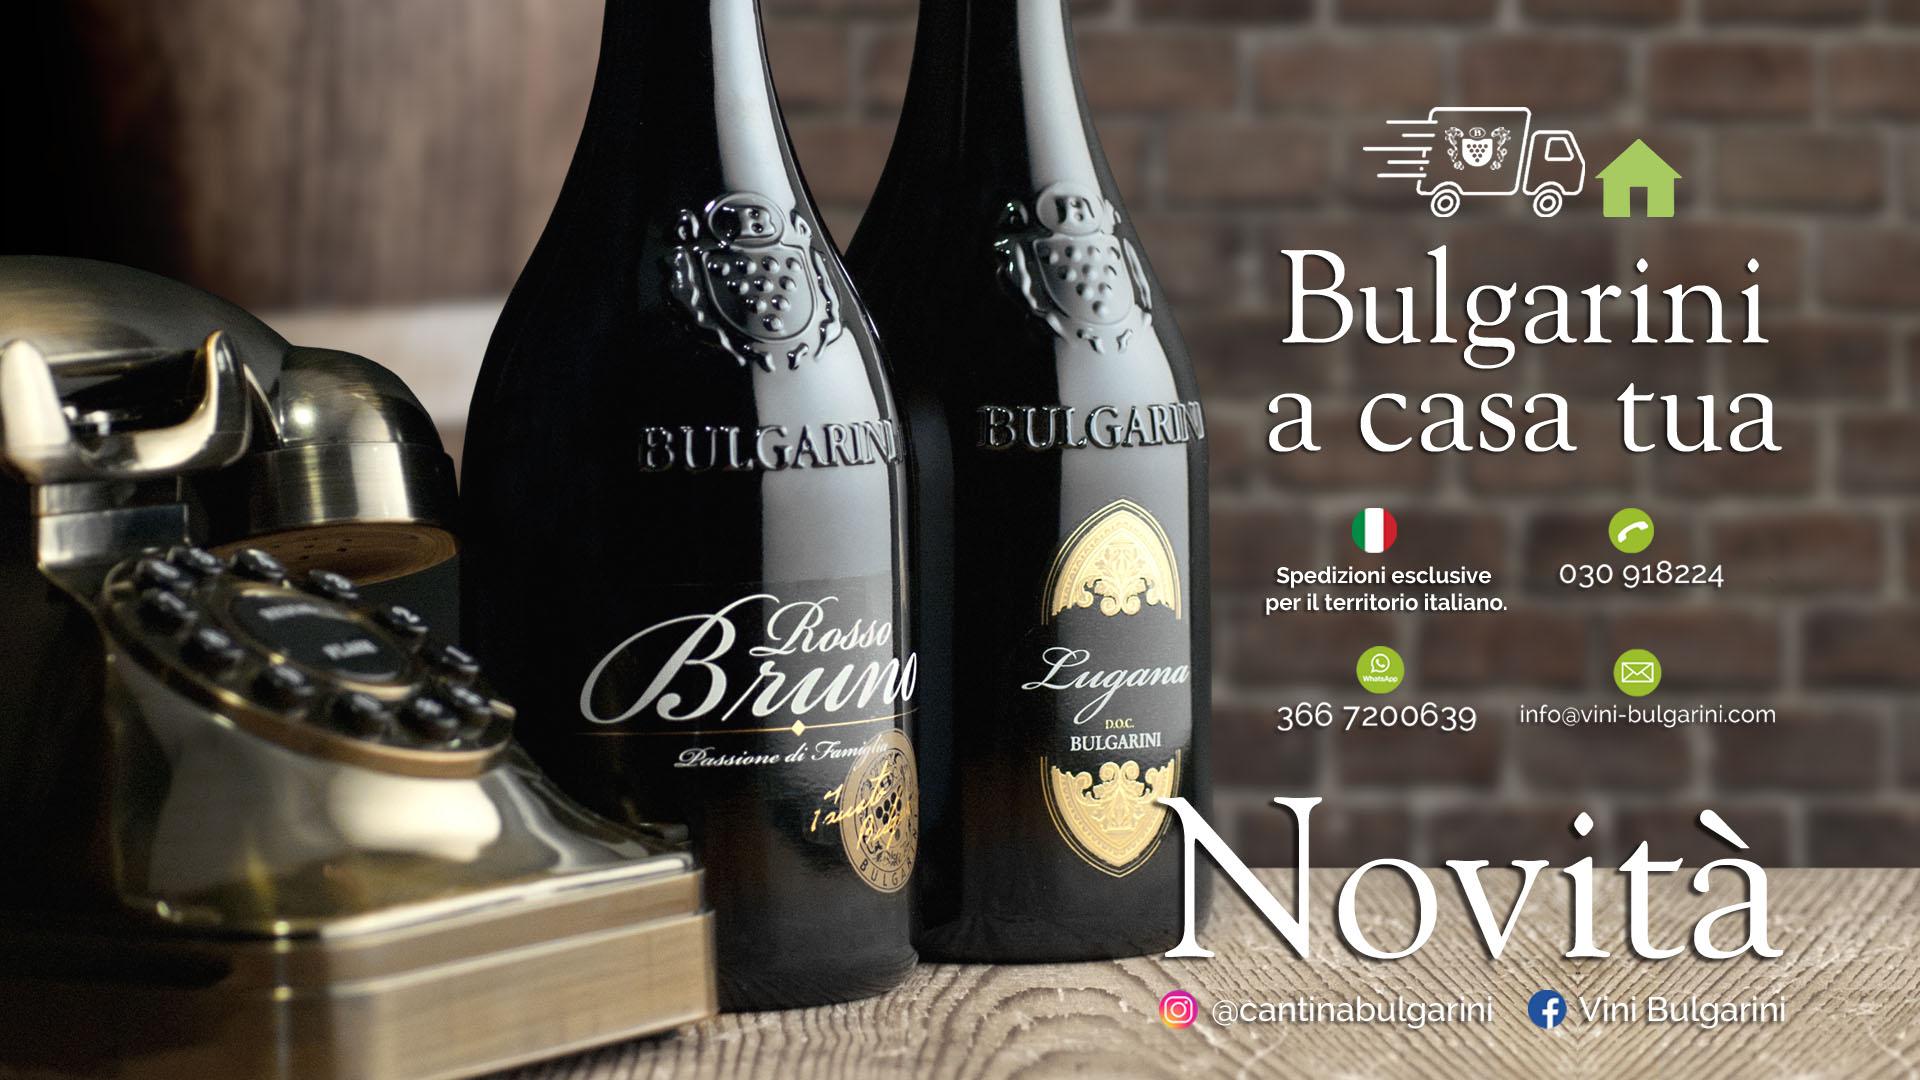 Bulgarini A Casa Tua 2020 slide